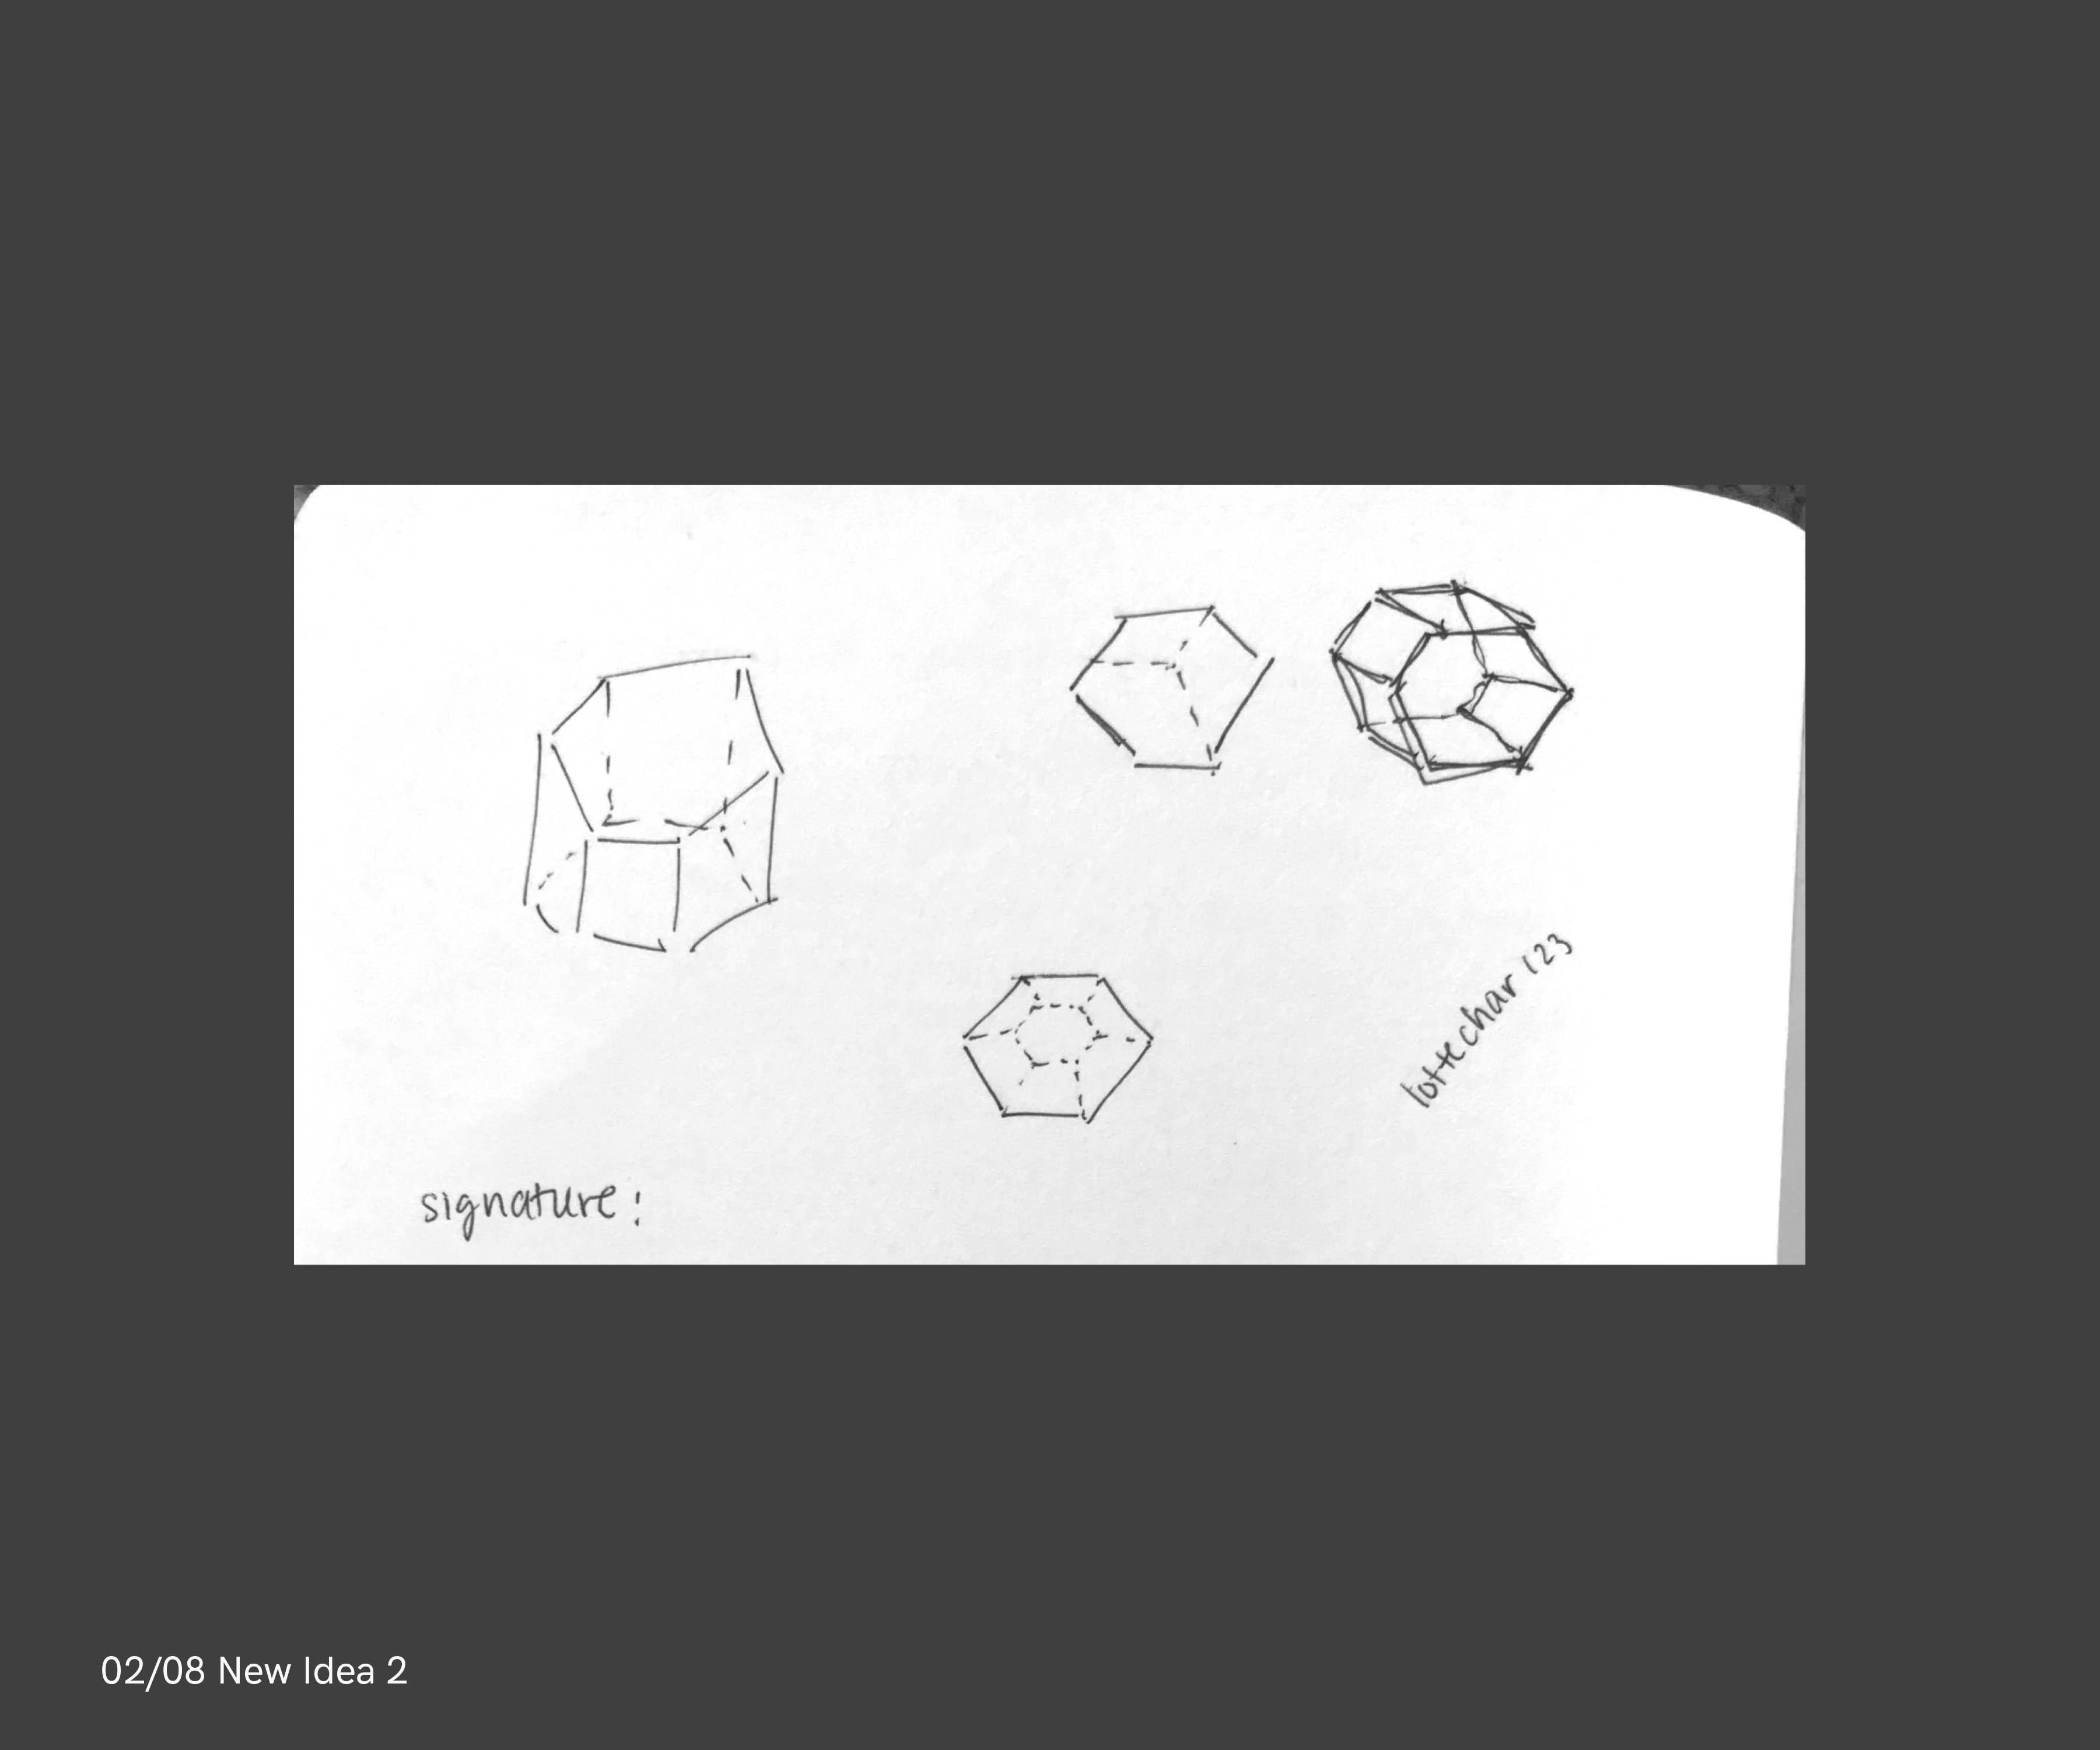 b_process_logo2_sketches-2.1